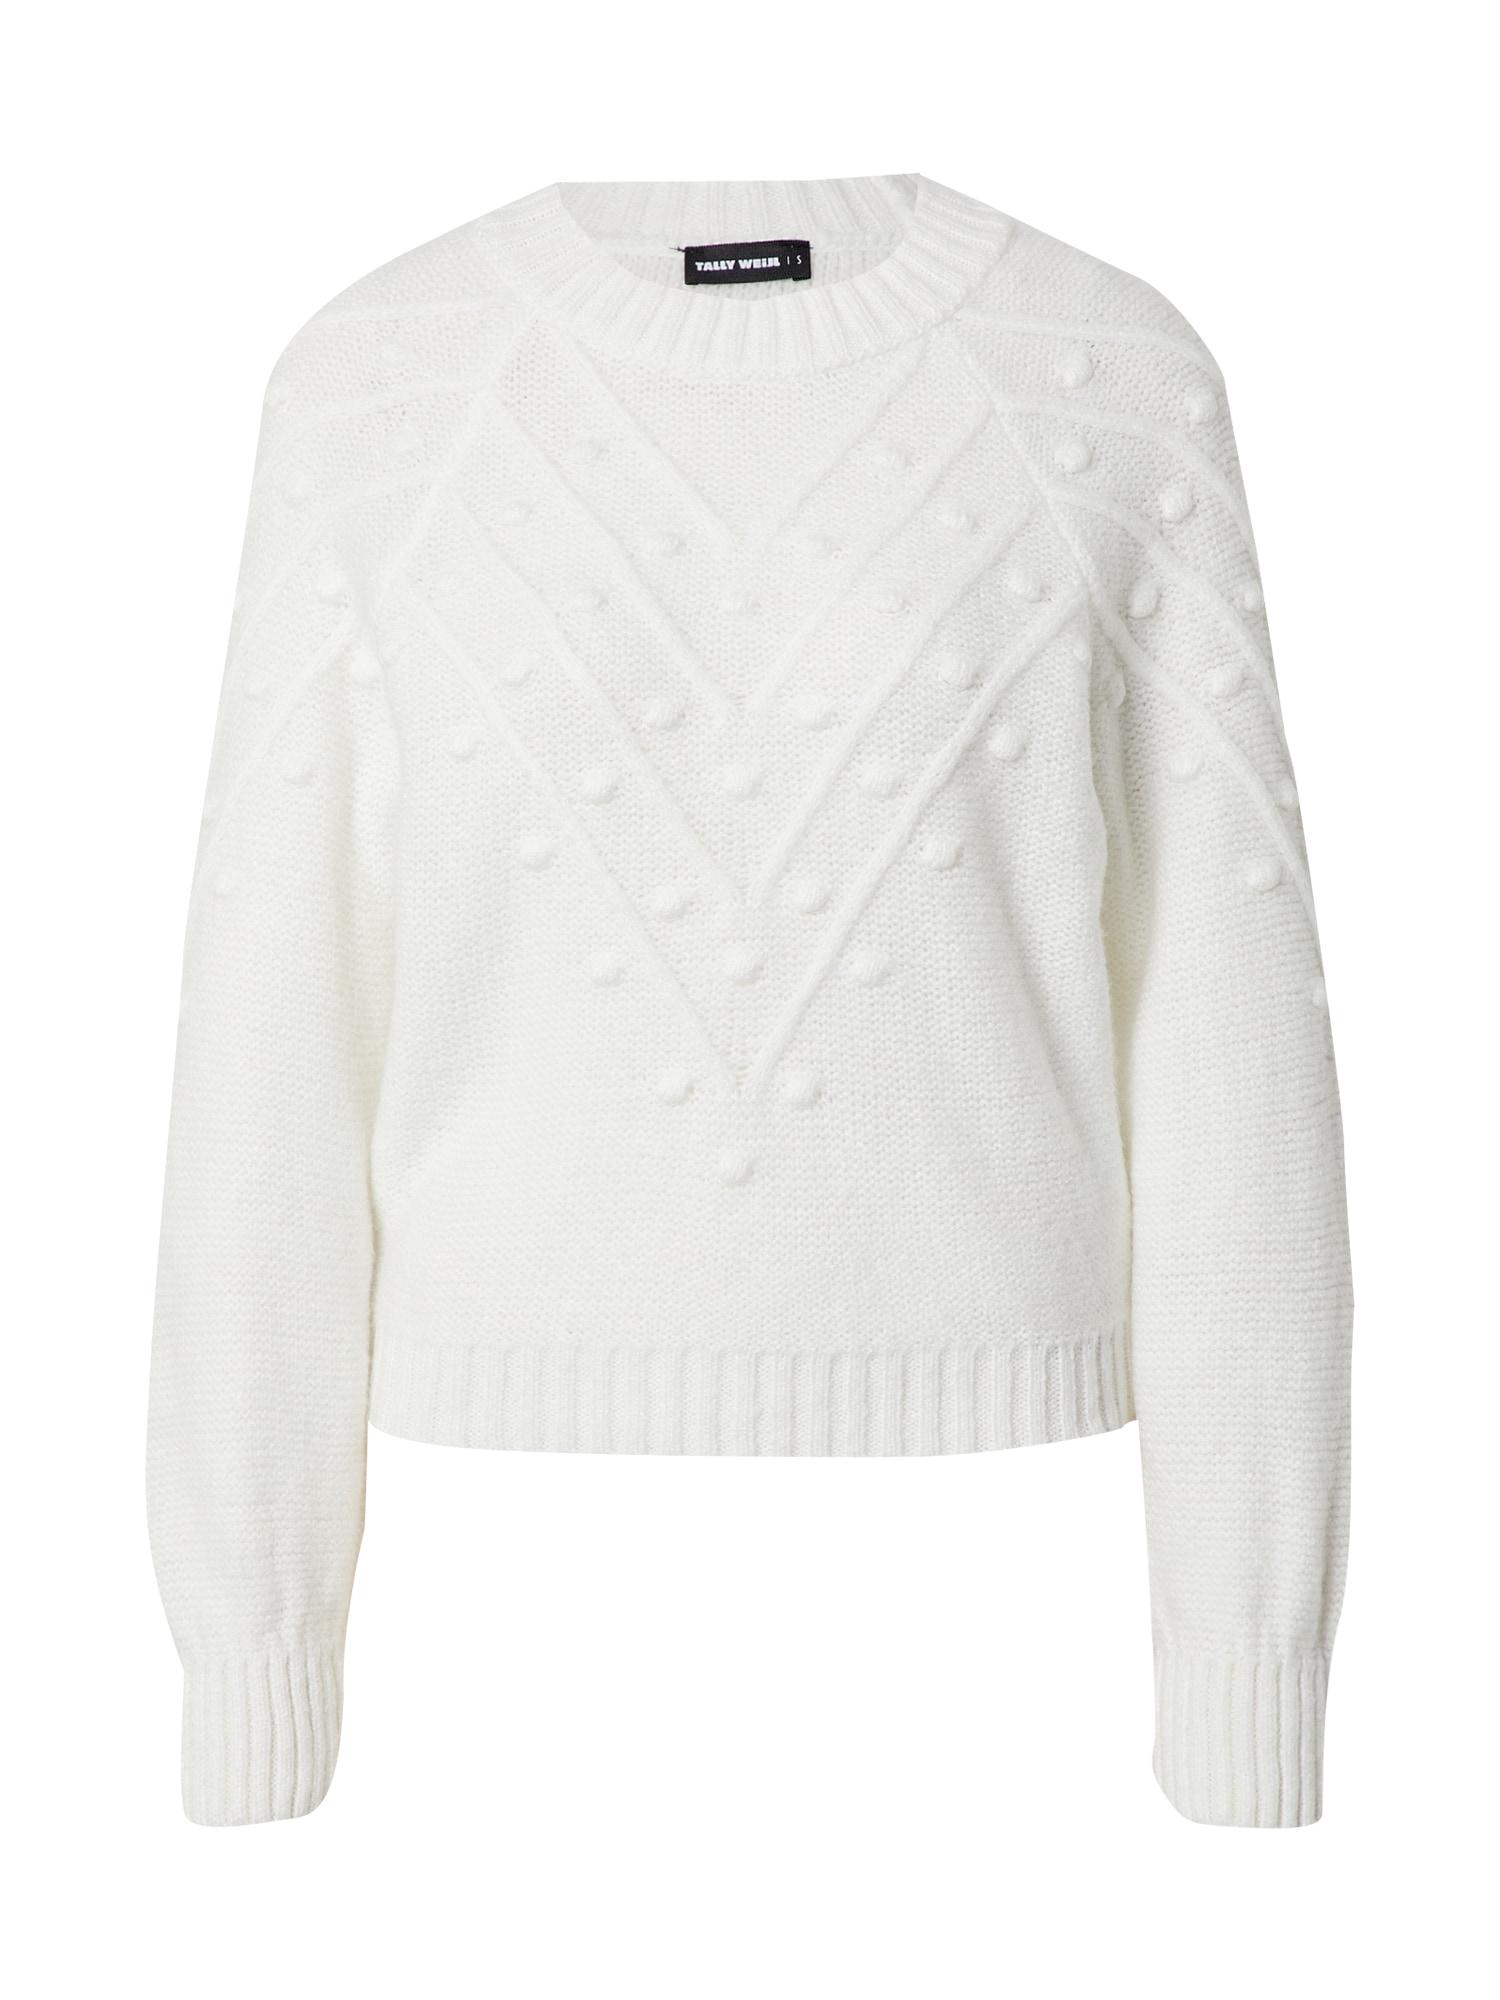 Tally Weijl Megztinis natūrali balta